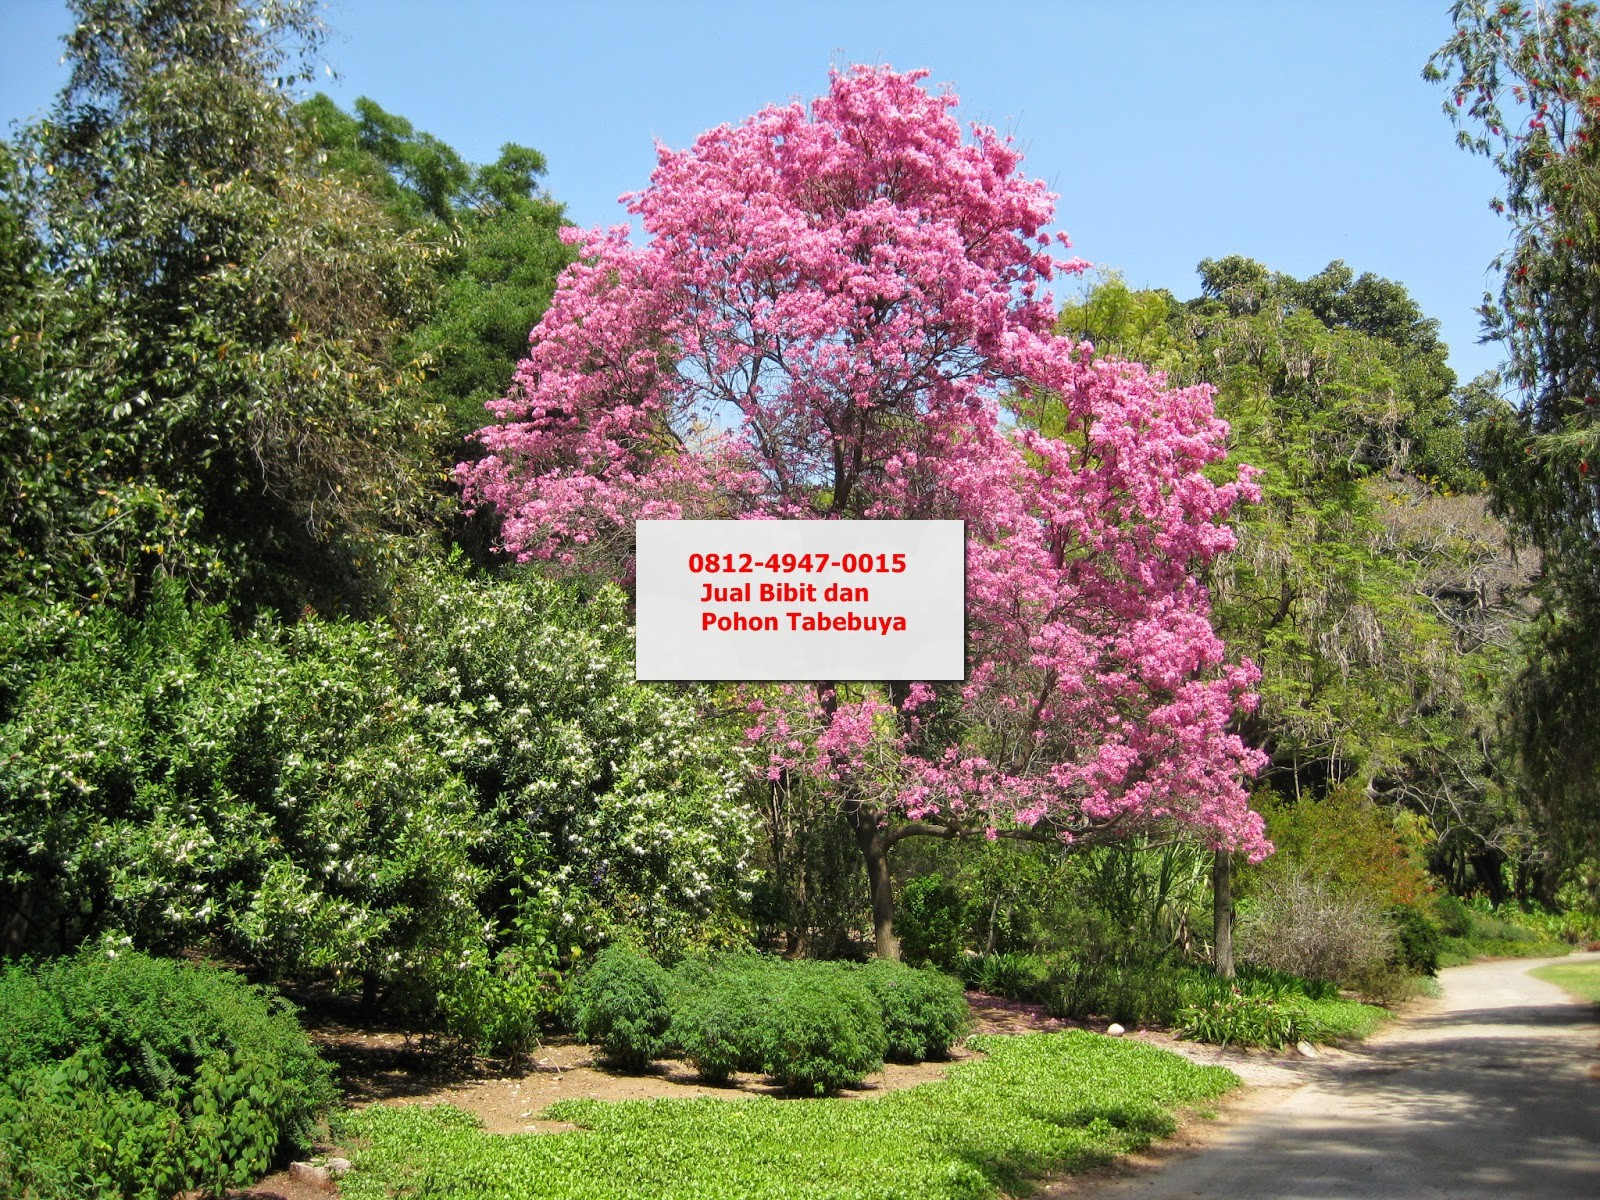 Jual Bibit Pohon Tabebuya Pink di Malang